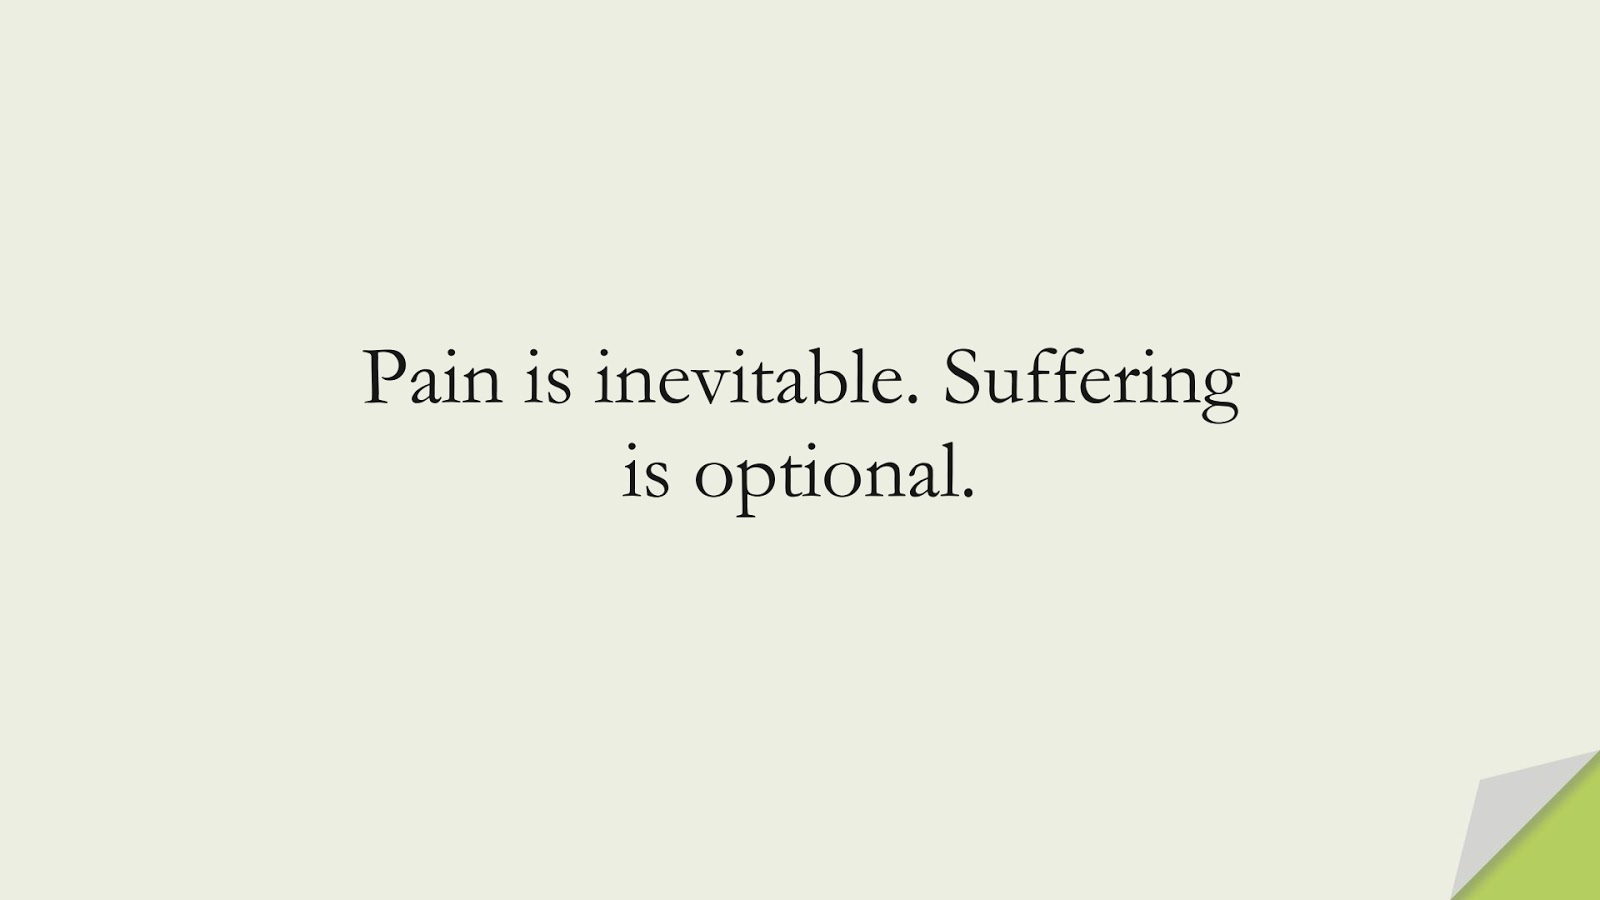 Pain is inevitable. Suffering is optional.FALSE